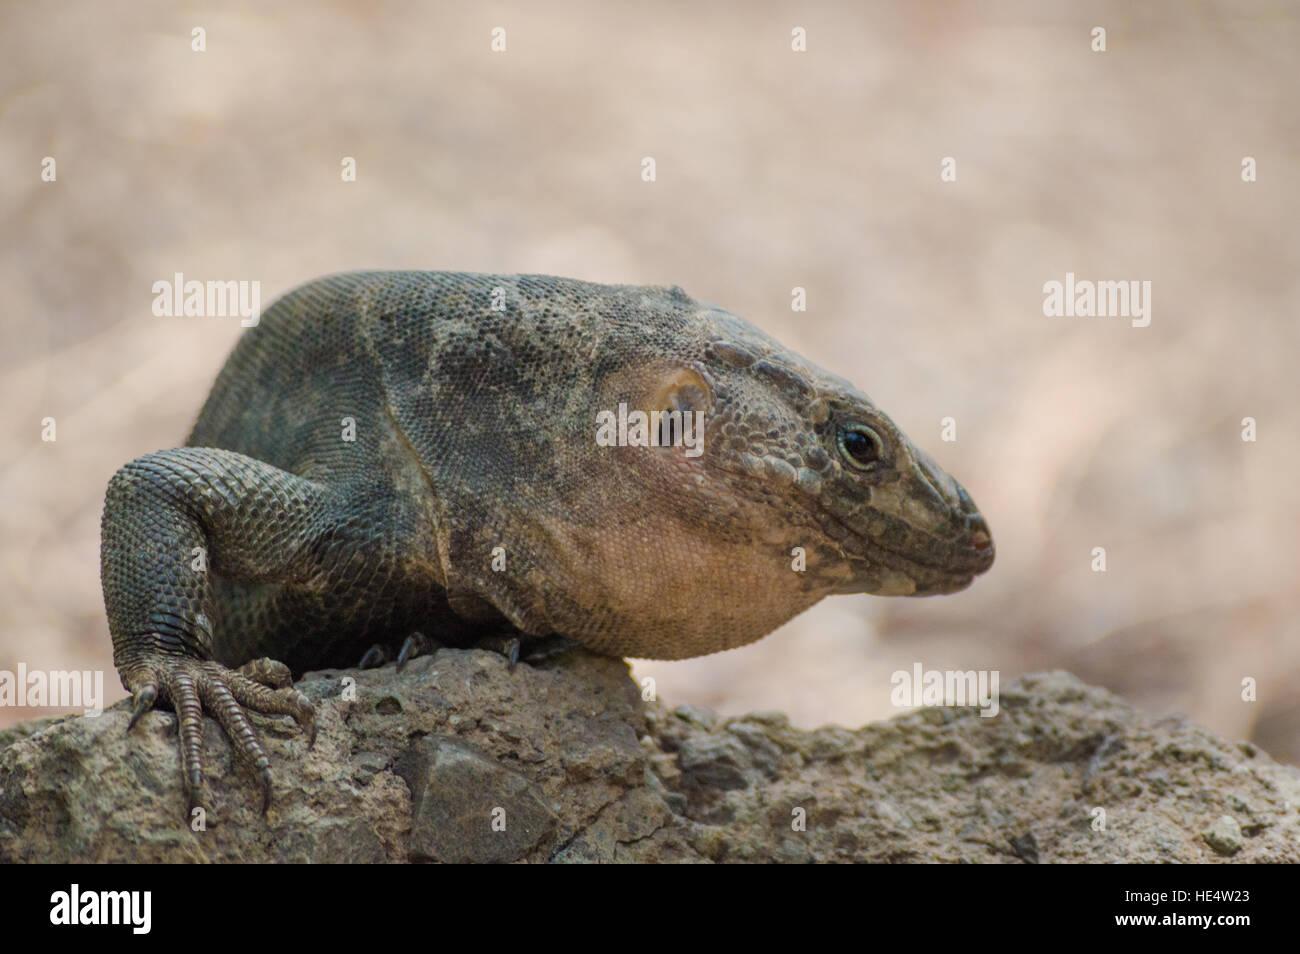 Lizard Basking on the rocks - Stock Image